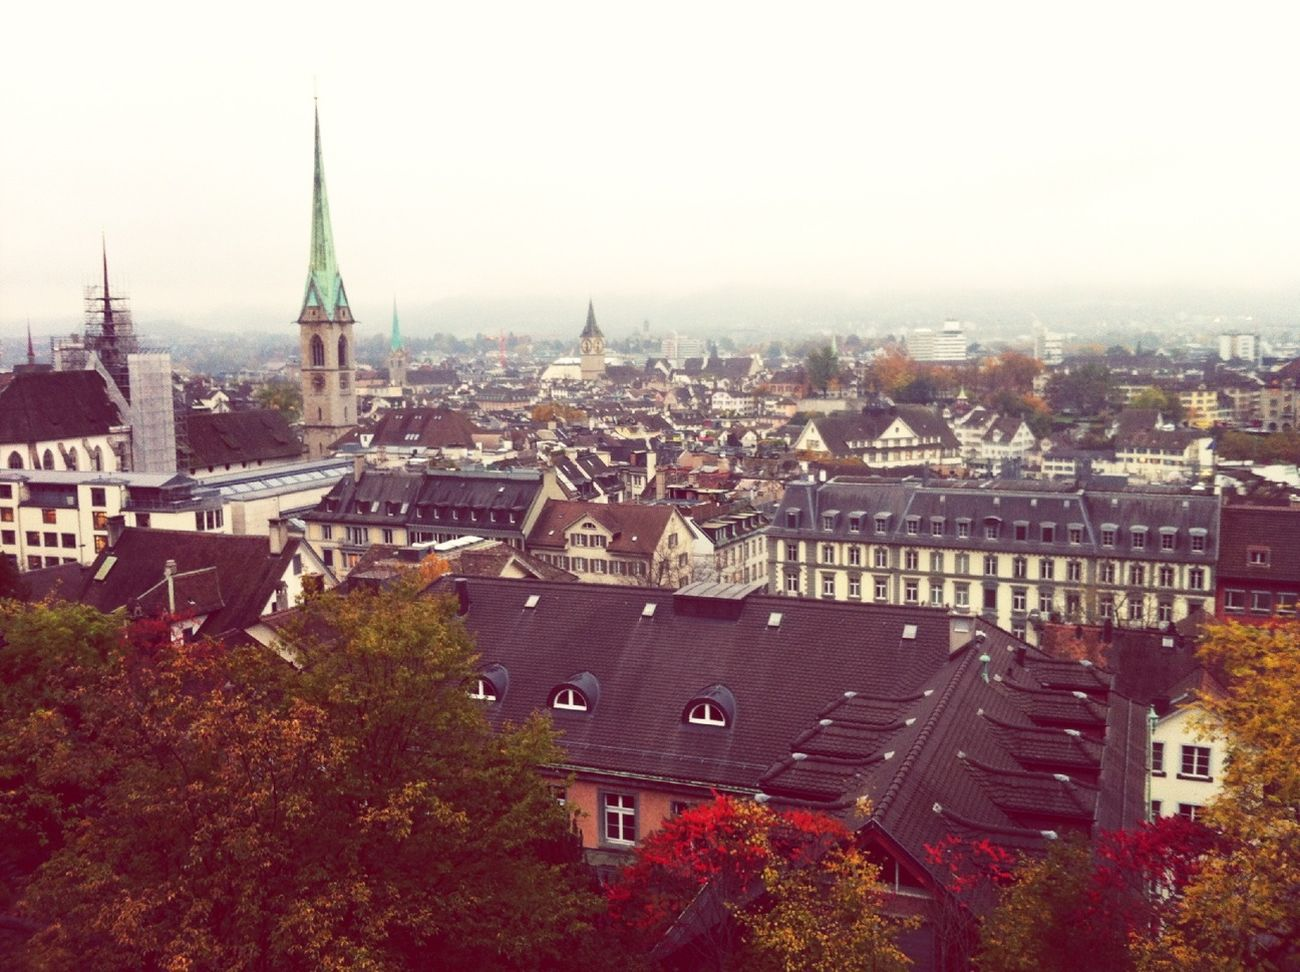 Testing EyeEm! Zurich! #chupazuckeberg